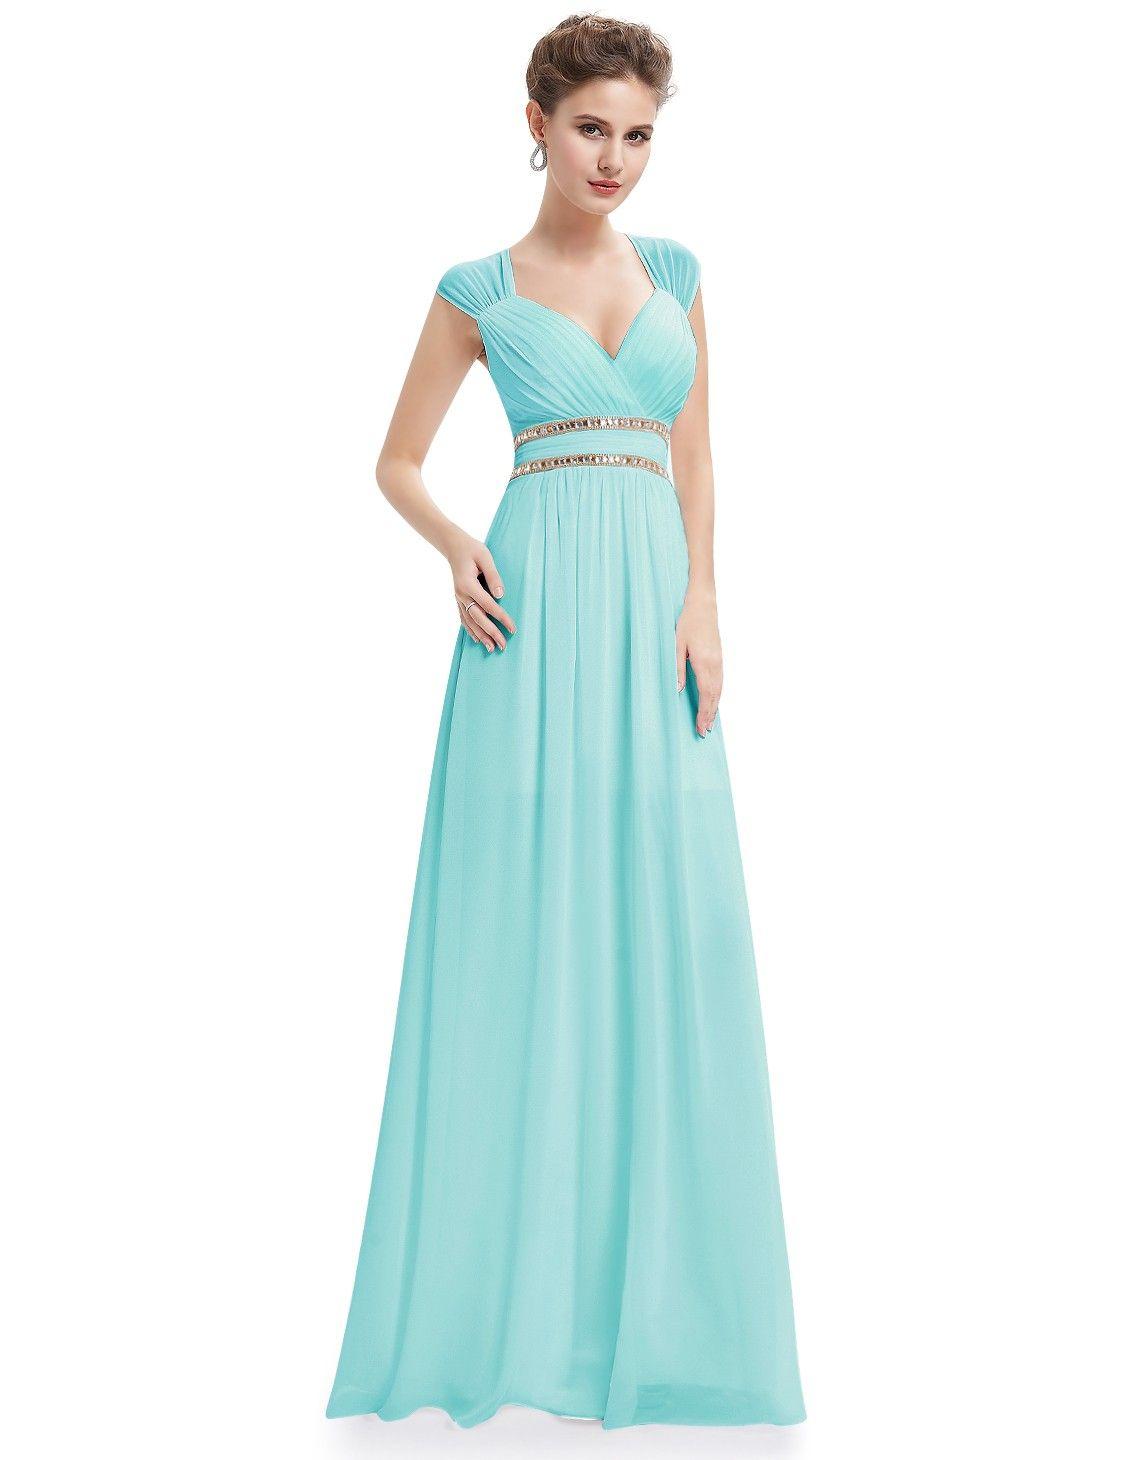 Sleeveless Grecian Style Evening Dress | Perfect prom dress, Grecian ...